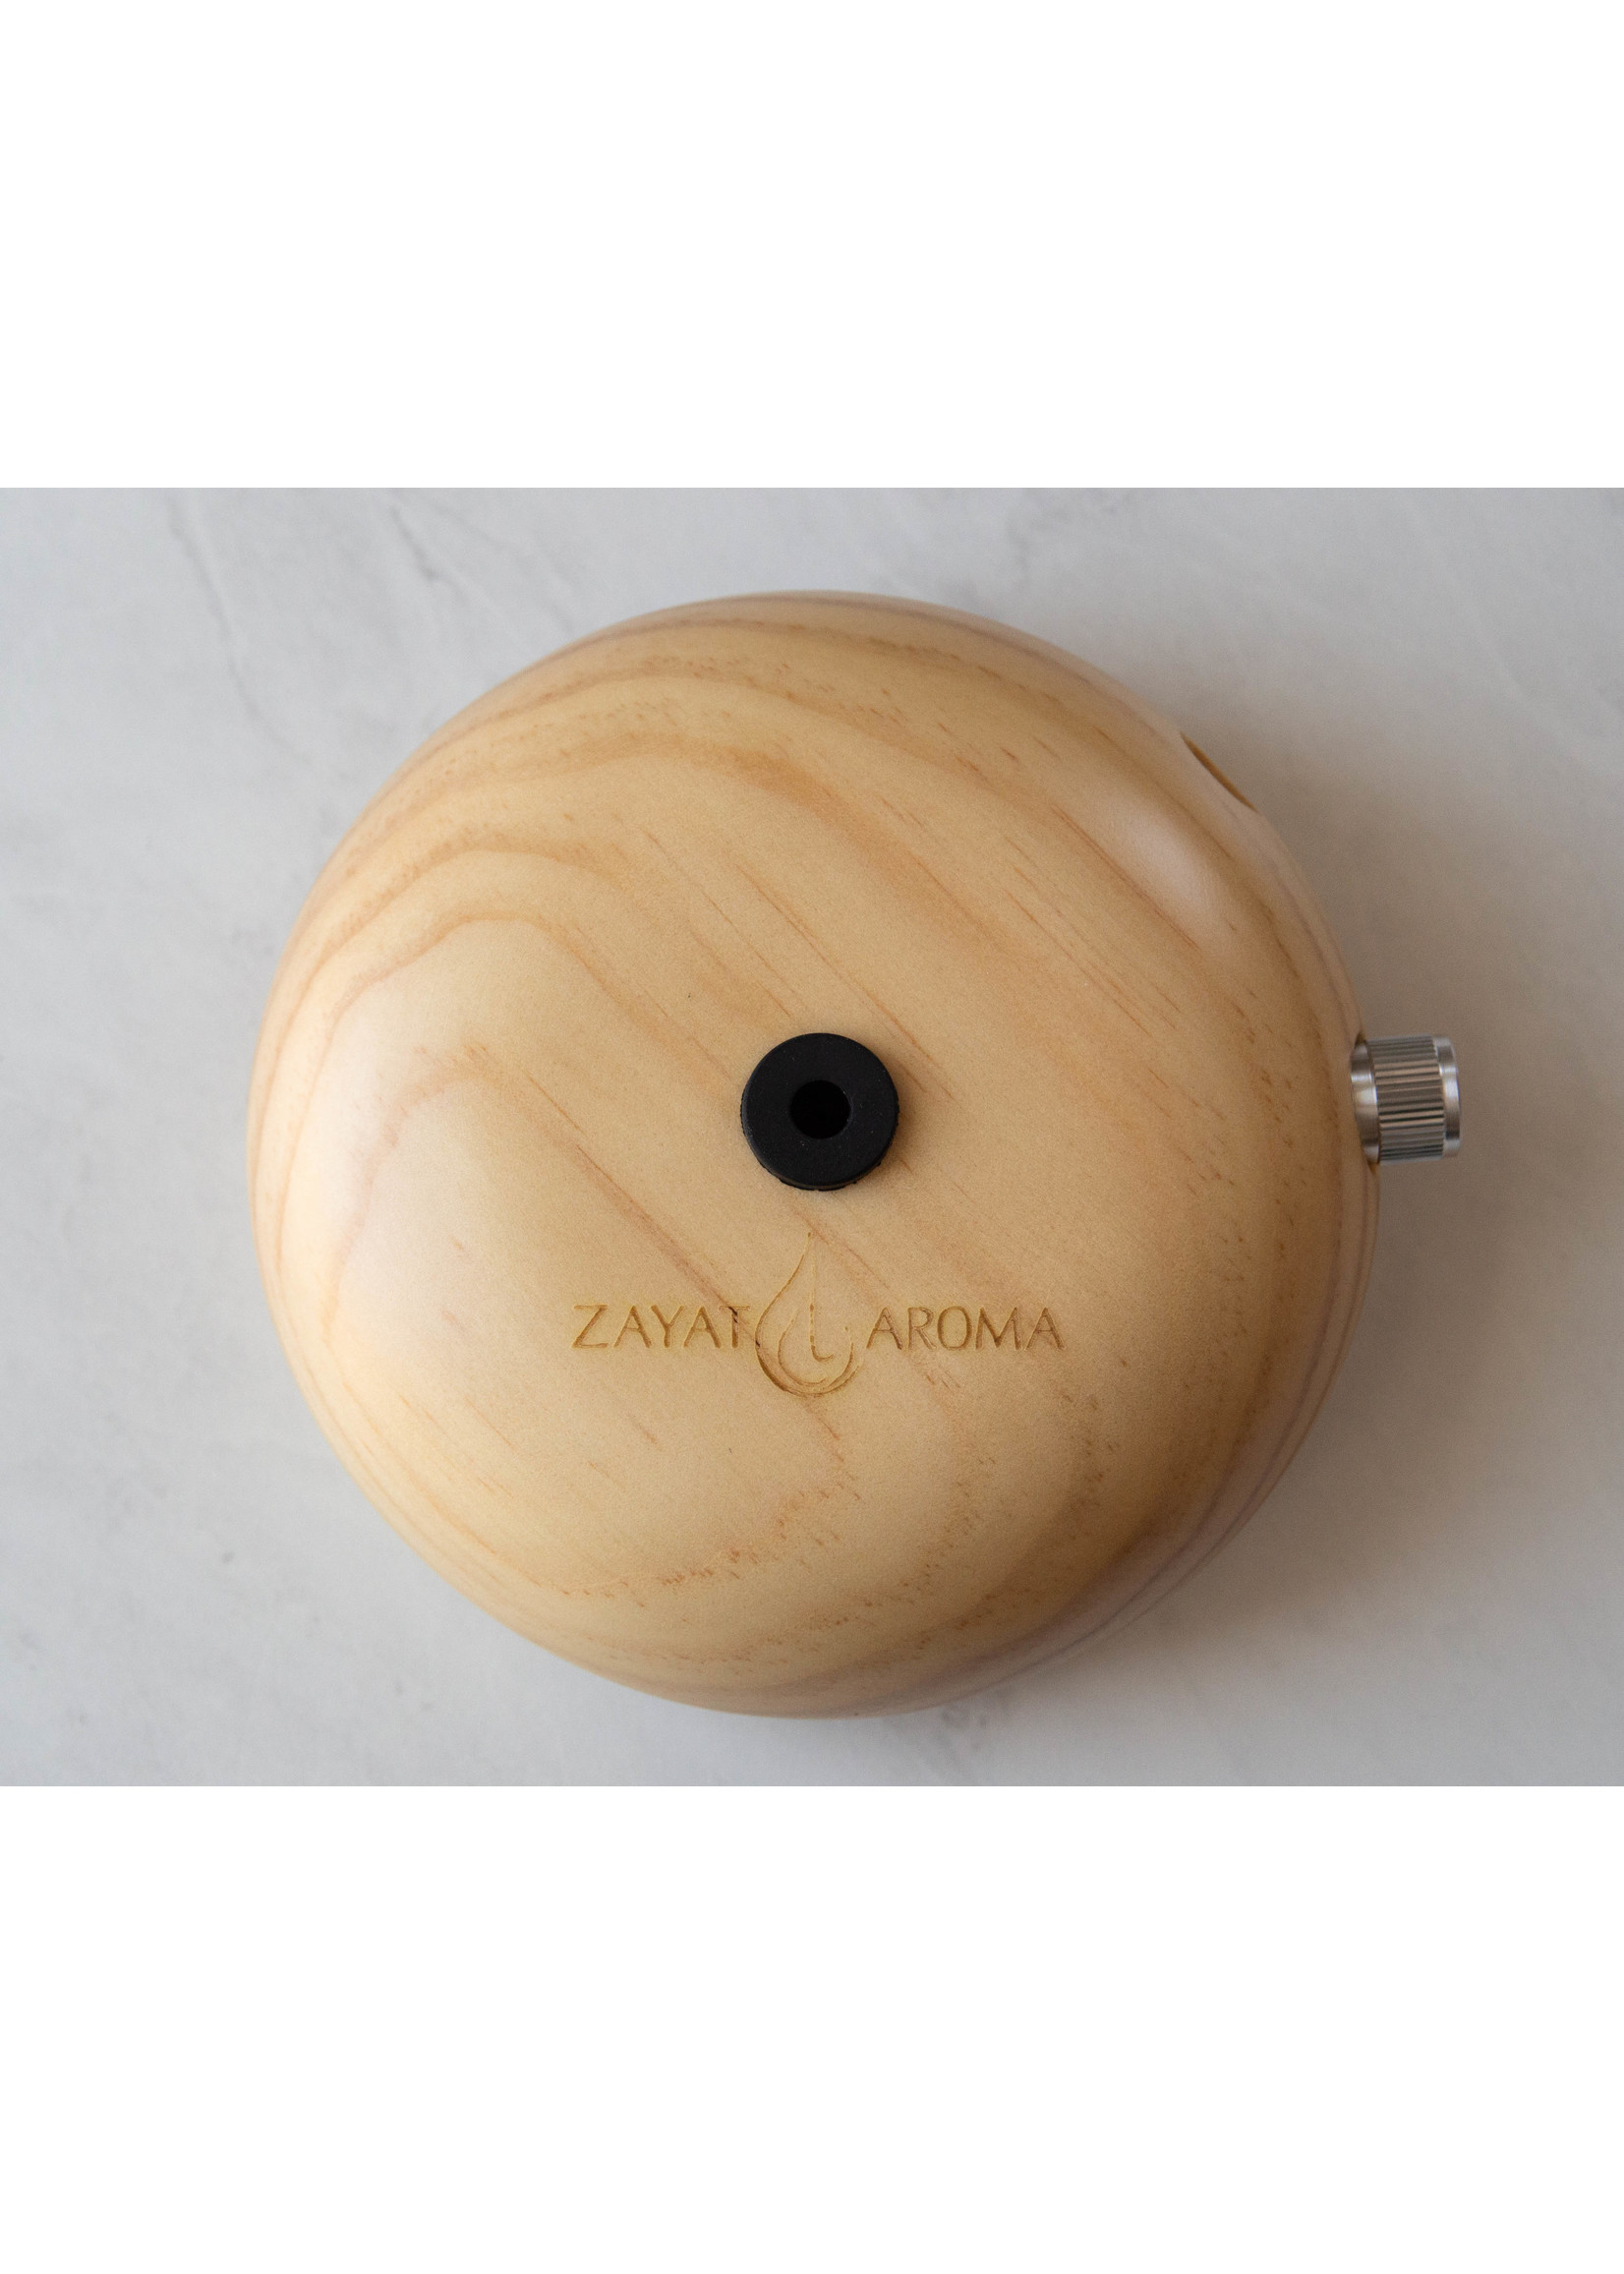 Zayat Diffusaroma Standard glass (ensemble)